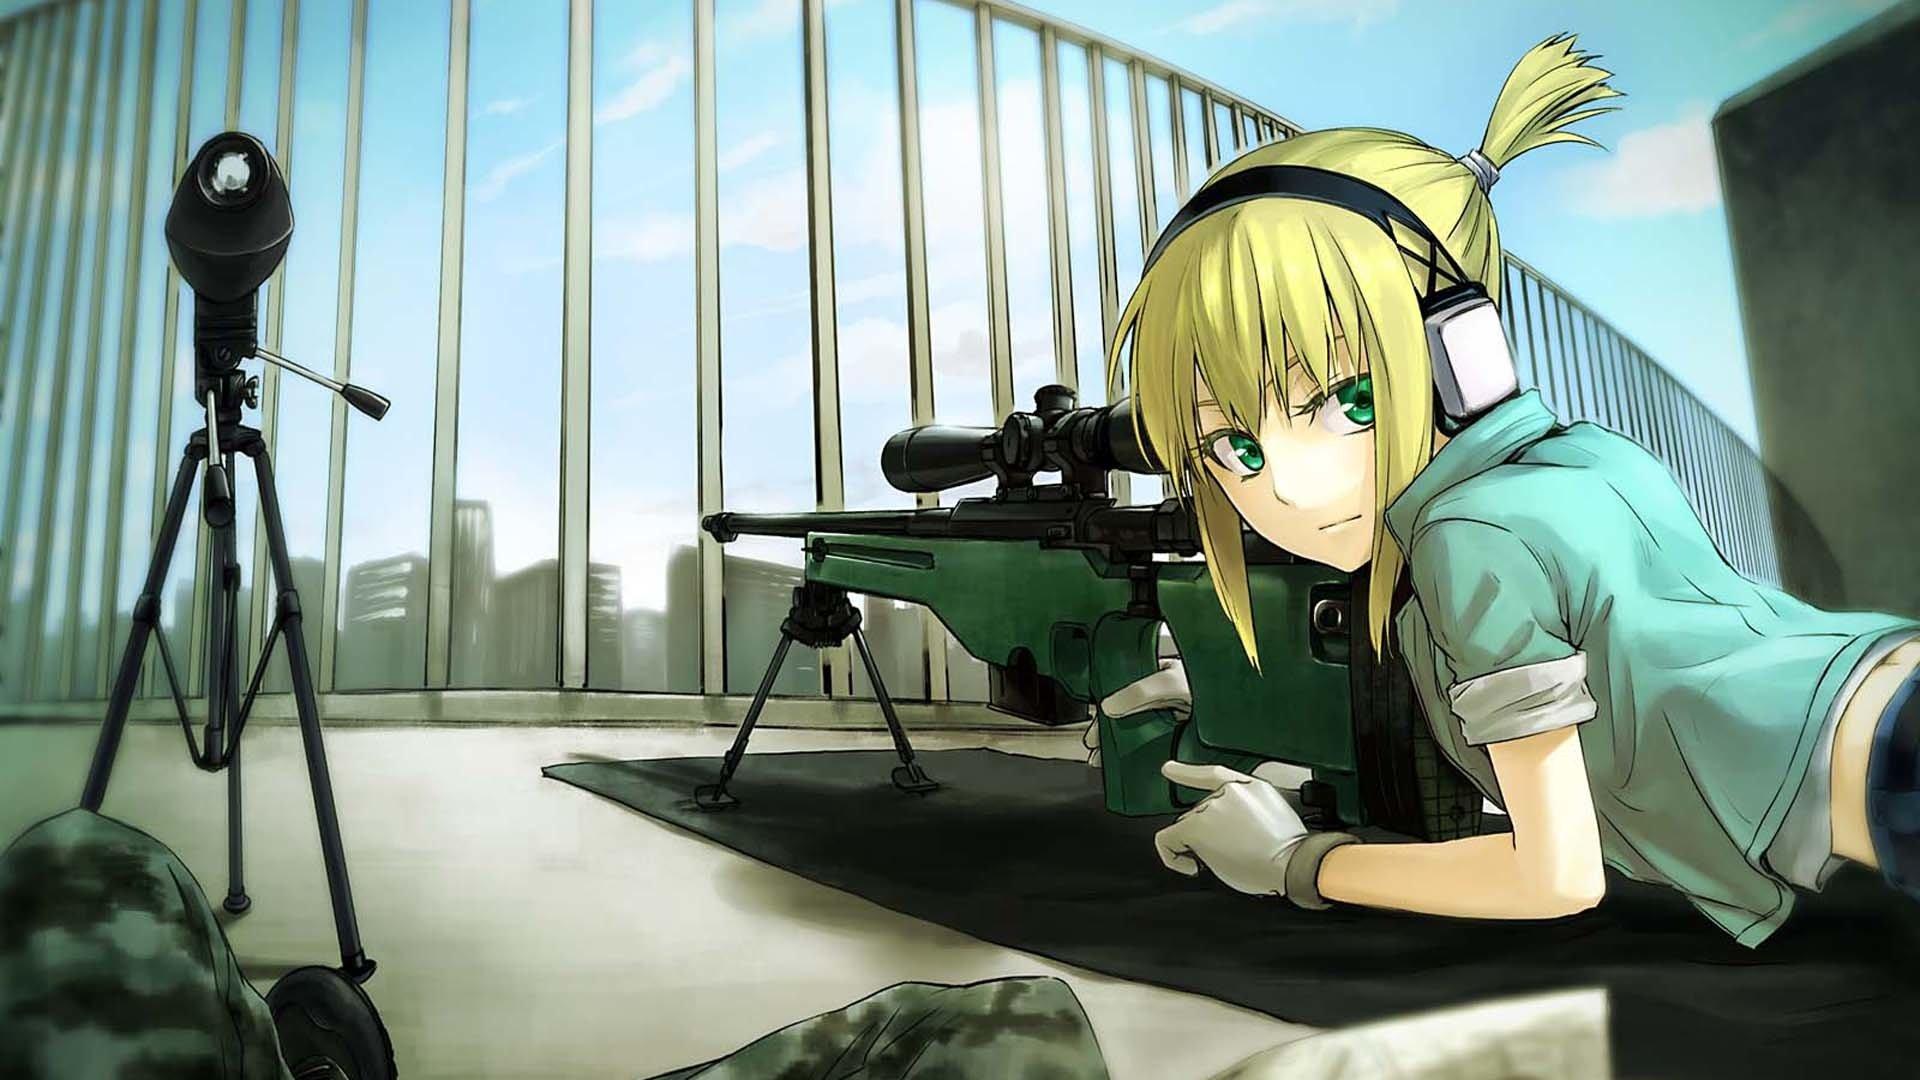 Anime - Vocaloid  Painting Girl Sniper Artistic Len Kagamine Wallpaper